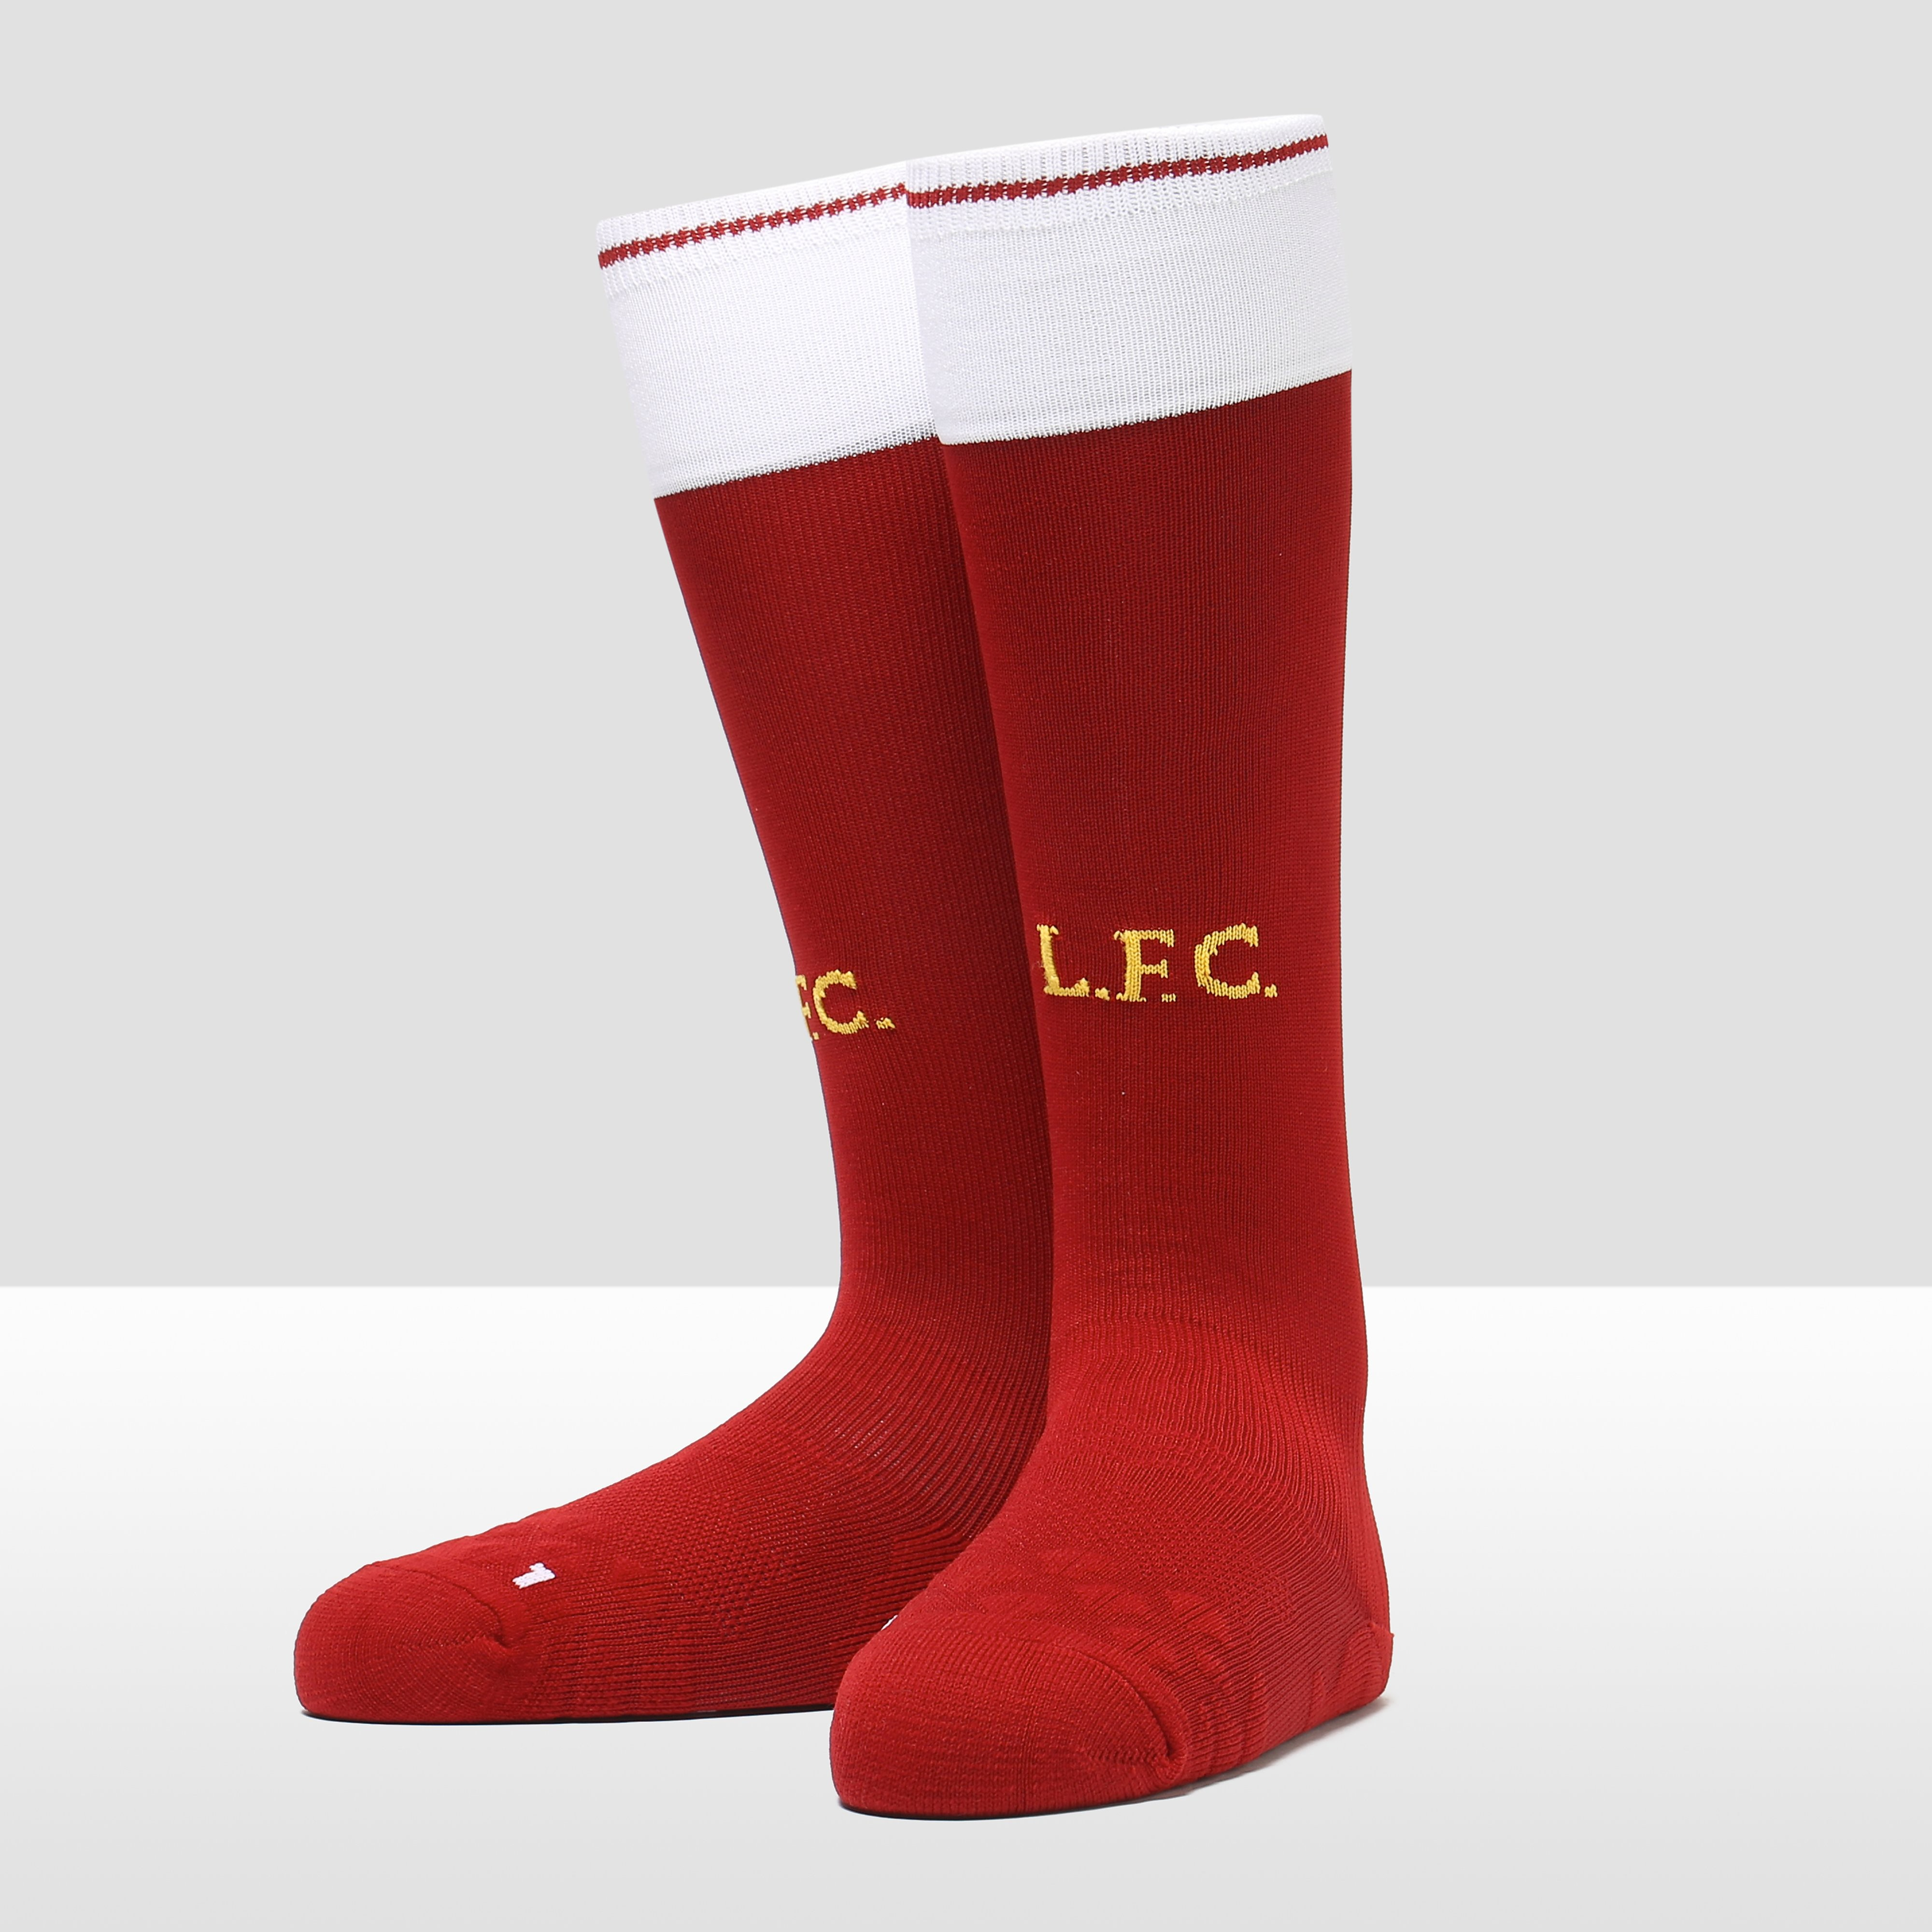 New Balance LFC Home Junior Football Socks